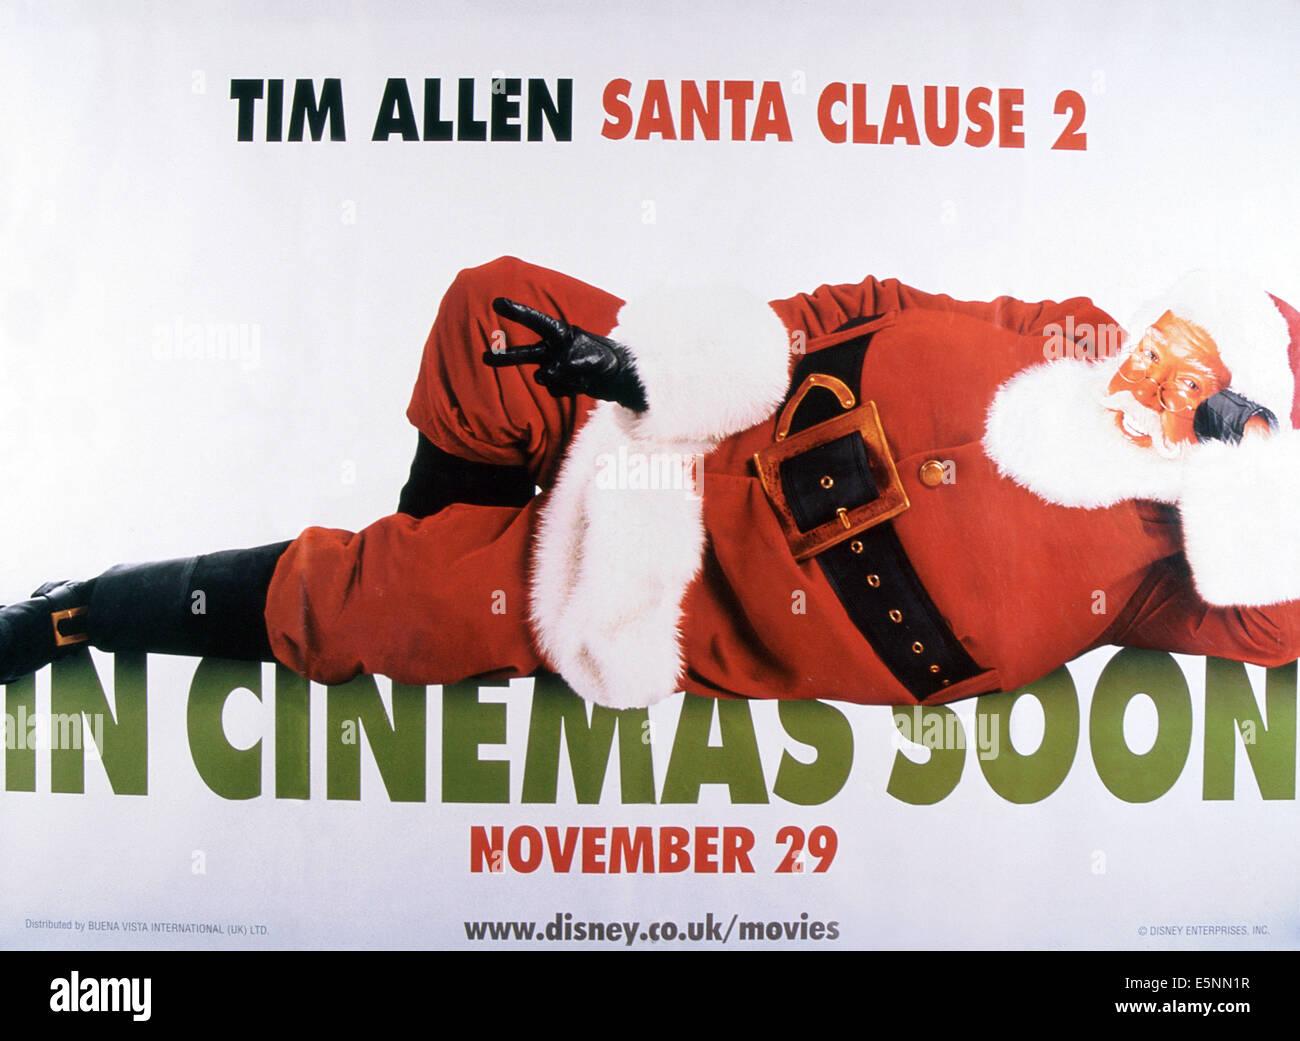 THE SANTA CLAUSE 2, US poster, Tim Allen, 2002, © Buena Vista/courtesy Everett Collection - Stock Image